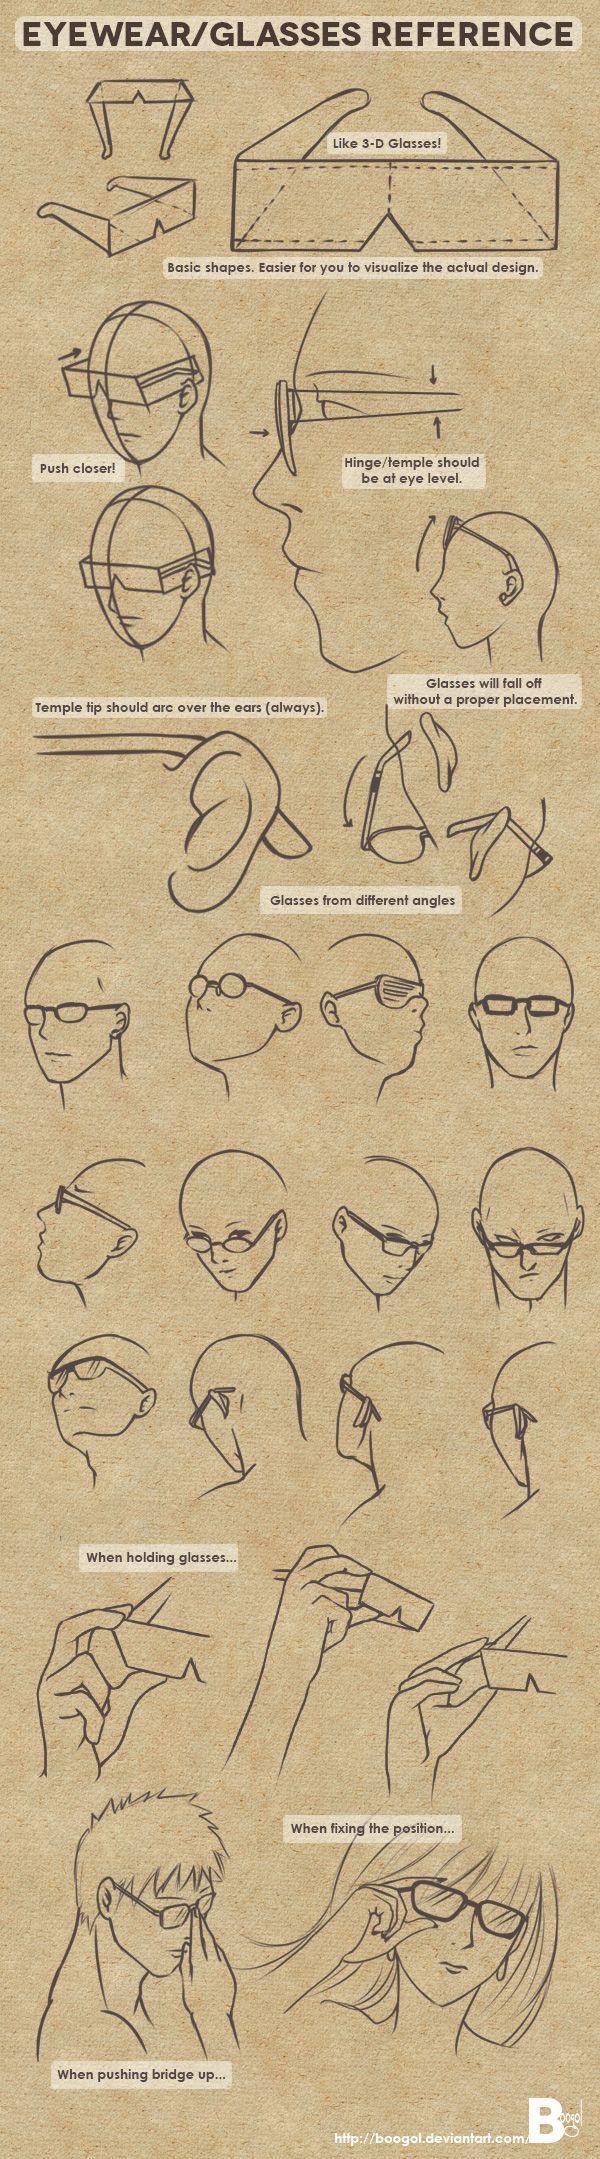 Eyewear/Glasses Reference by Boogol.deviantart... on @deviantART